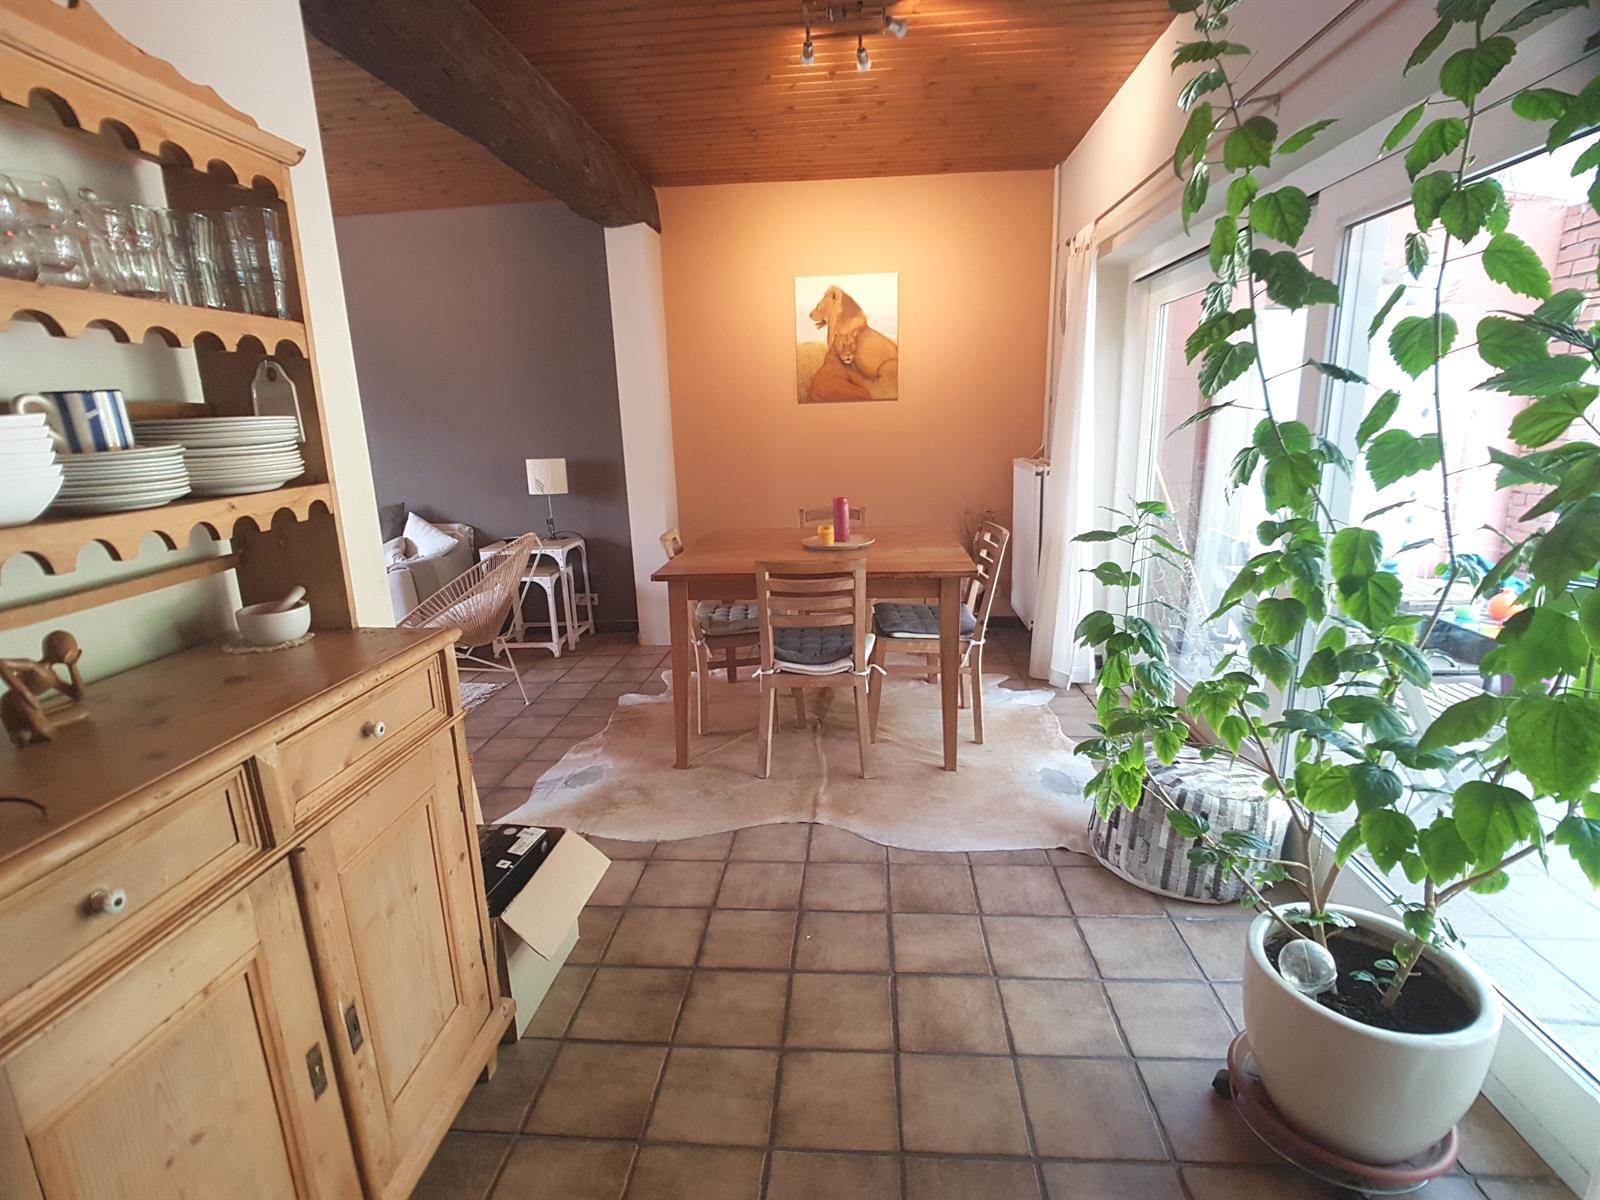 Maison - Ottignies-Louvain-la-Neuve - #4161950-2